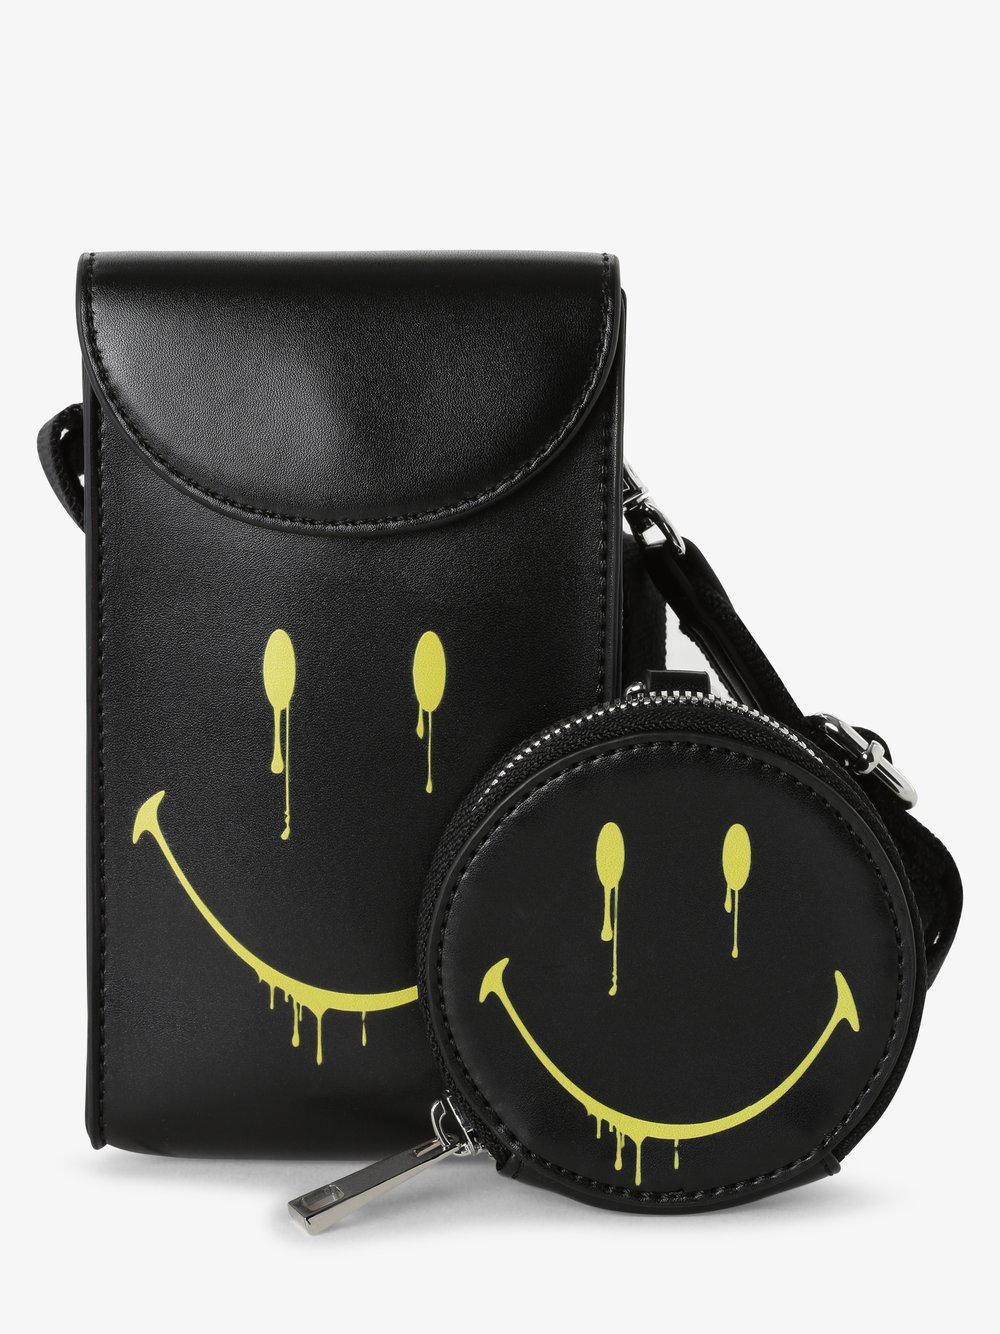 STEFFEN SCHRAUT – Damska torebka na ramię, różowy Van Graaf 483017-0001-00000